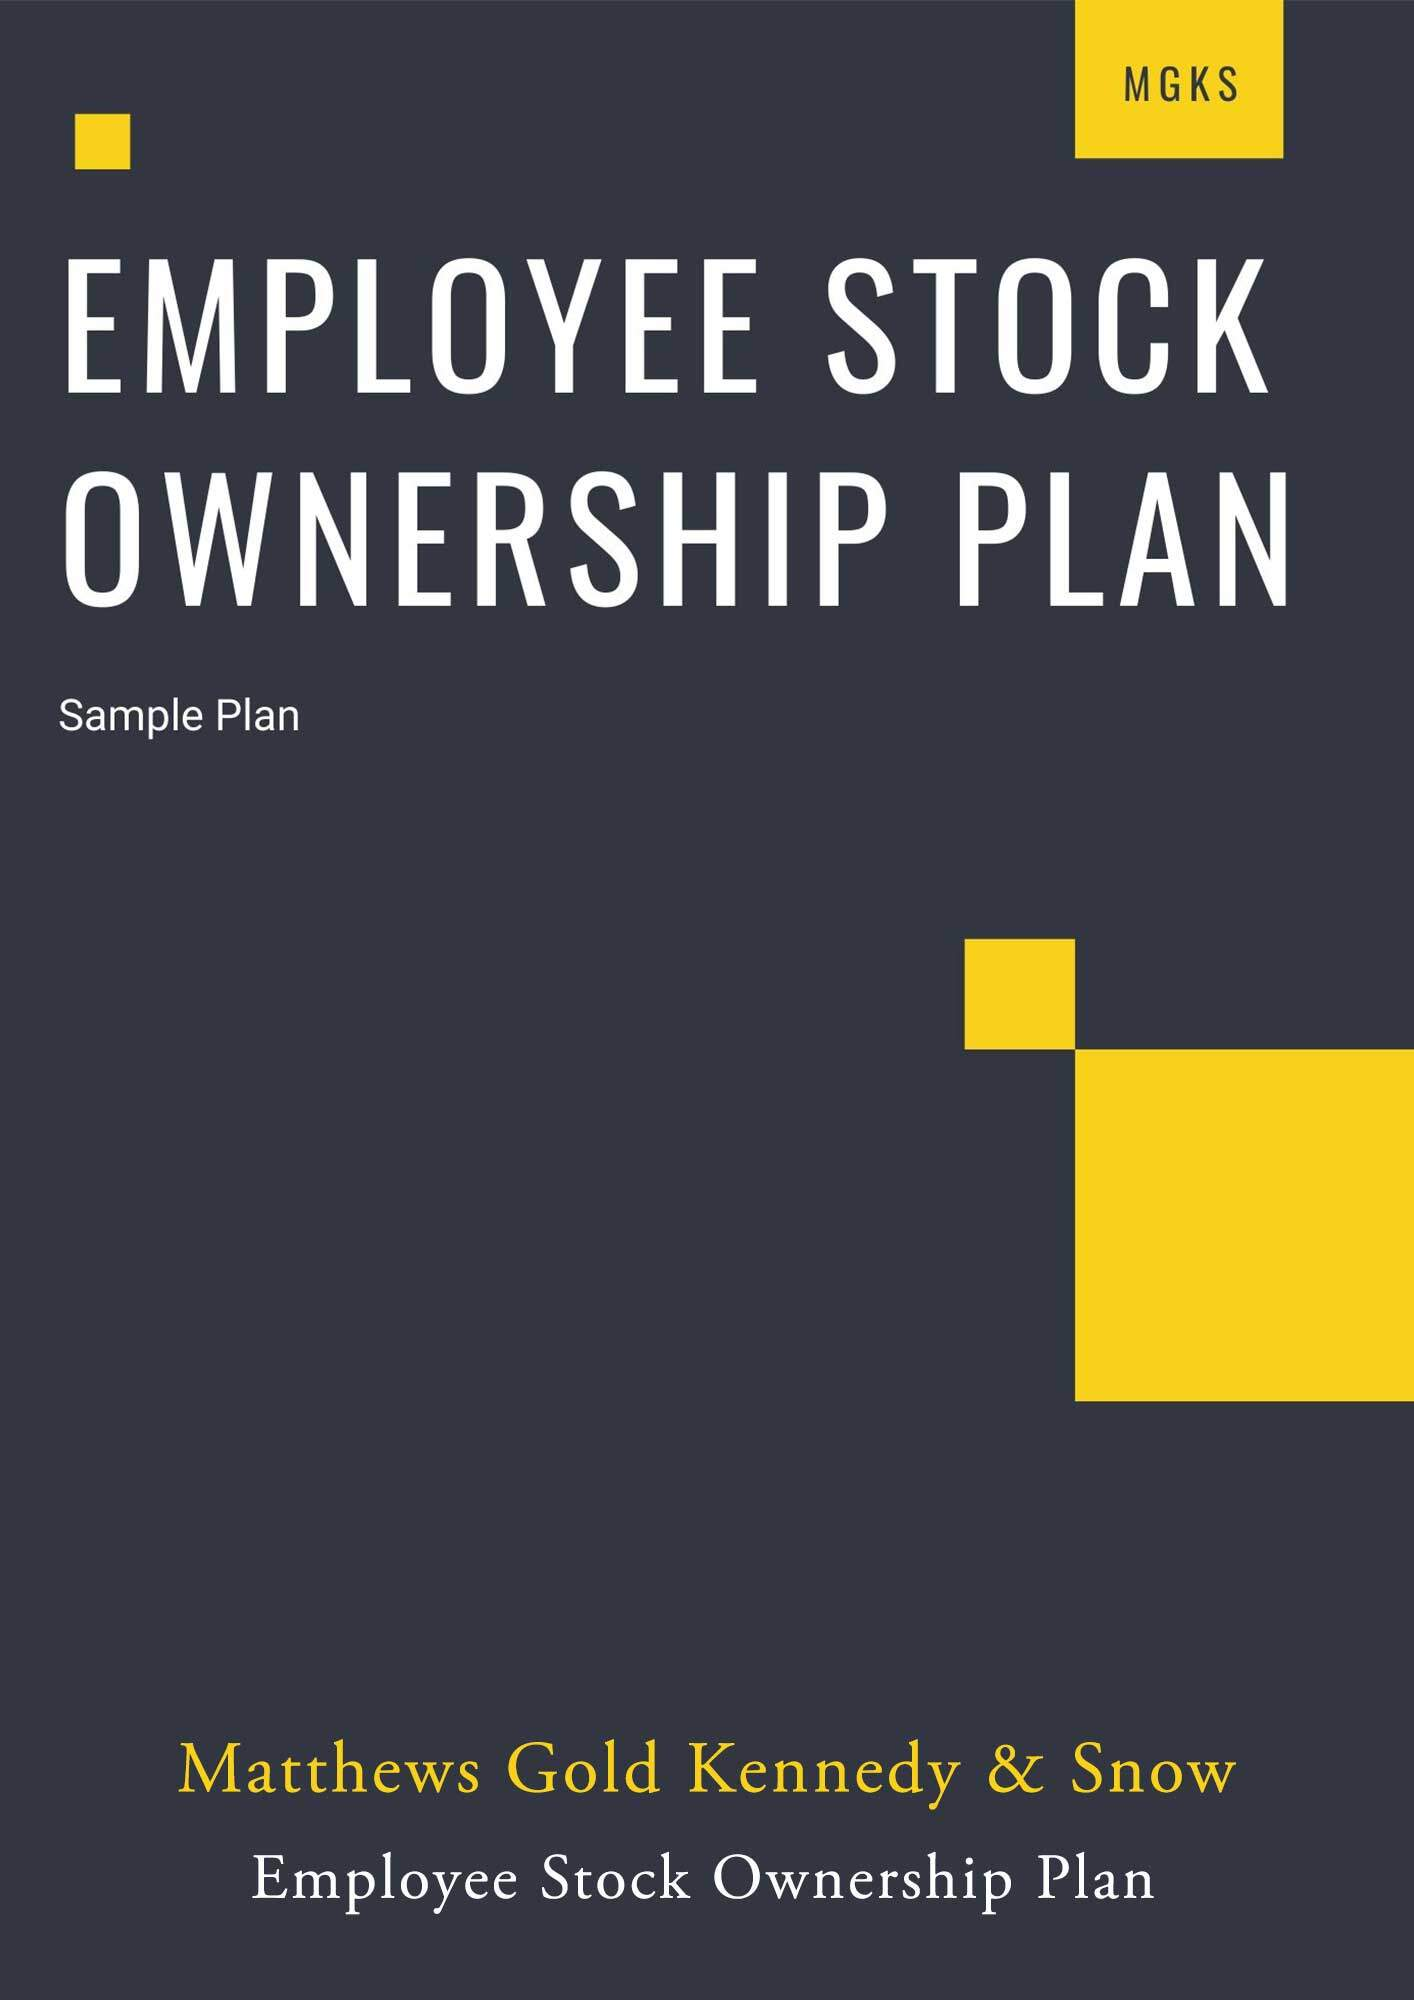 ESOP Book Cover